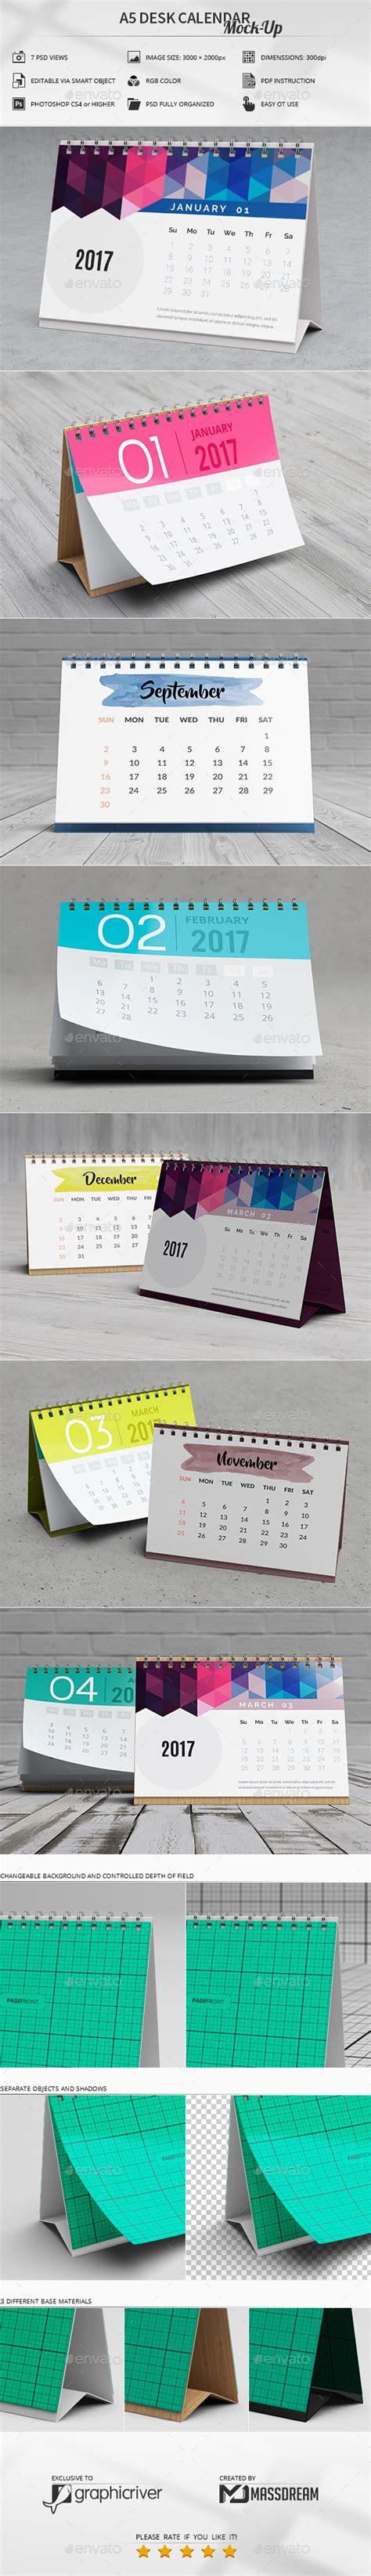 A5 Desk Calendar Mock Up By Massdream Graphicriver Mock Schedule Template